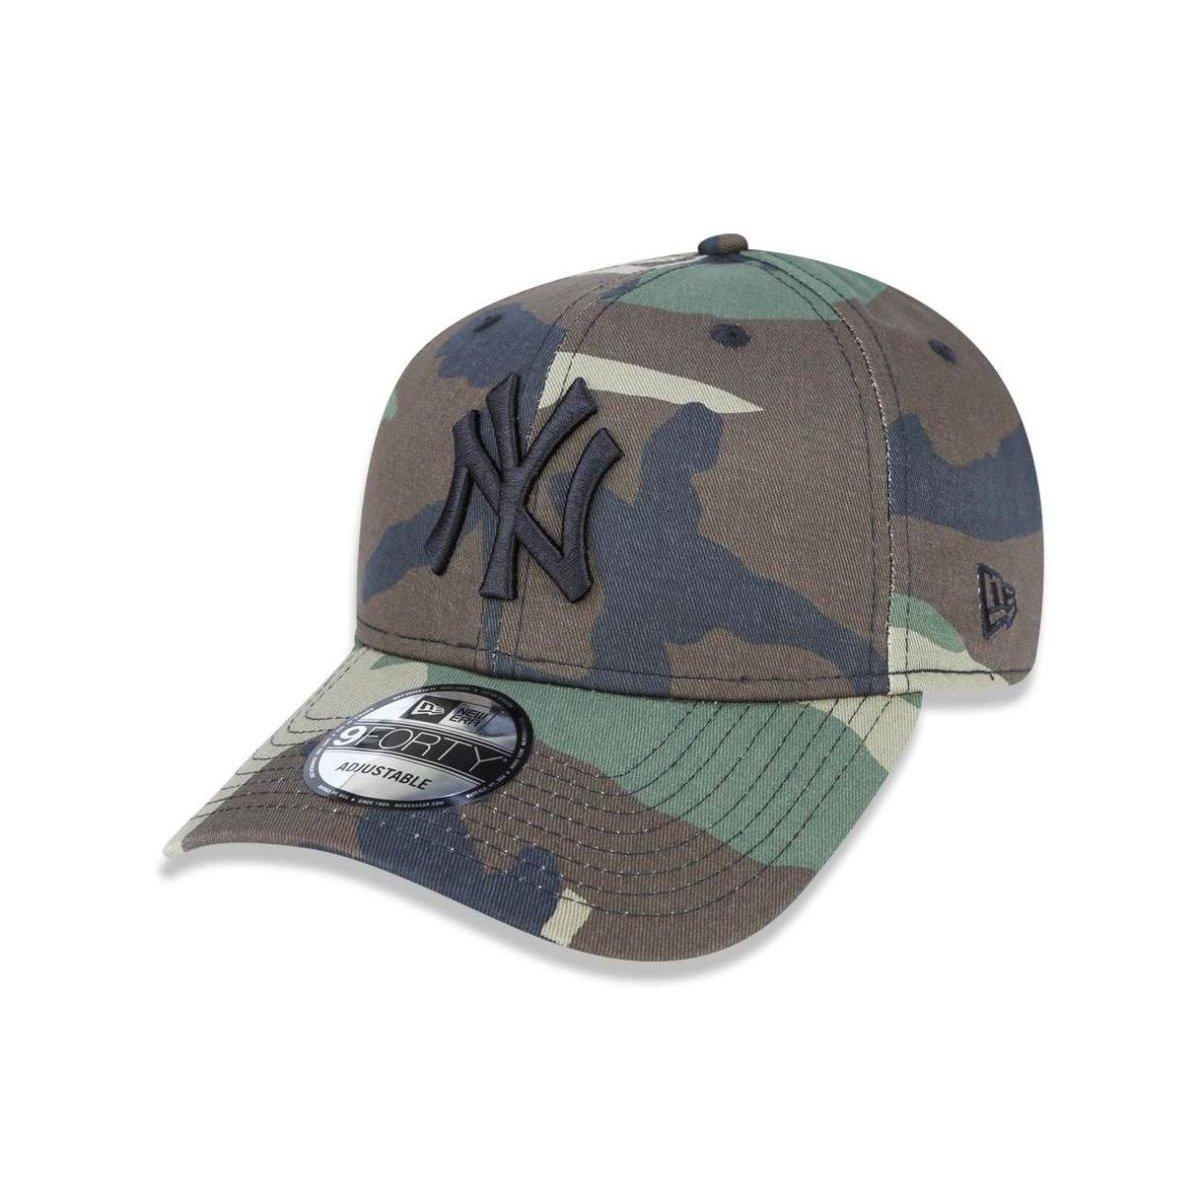 Boné New Era Aba Curva 940 Yankees Camuflado - Snapback - Compre Agora  b83556325c73c